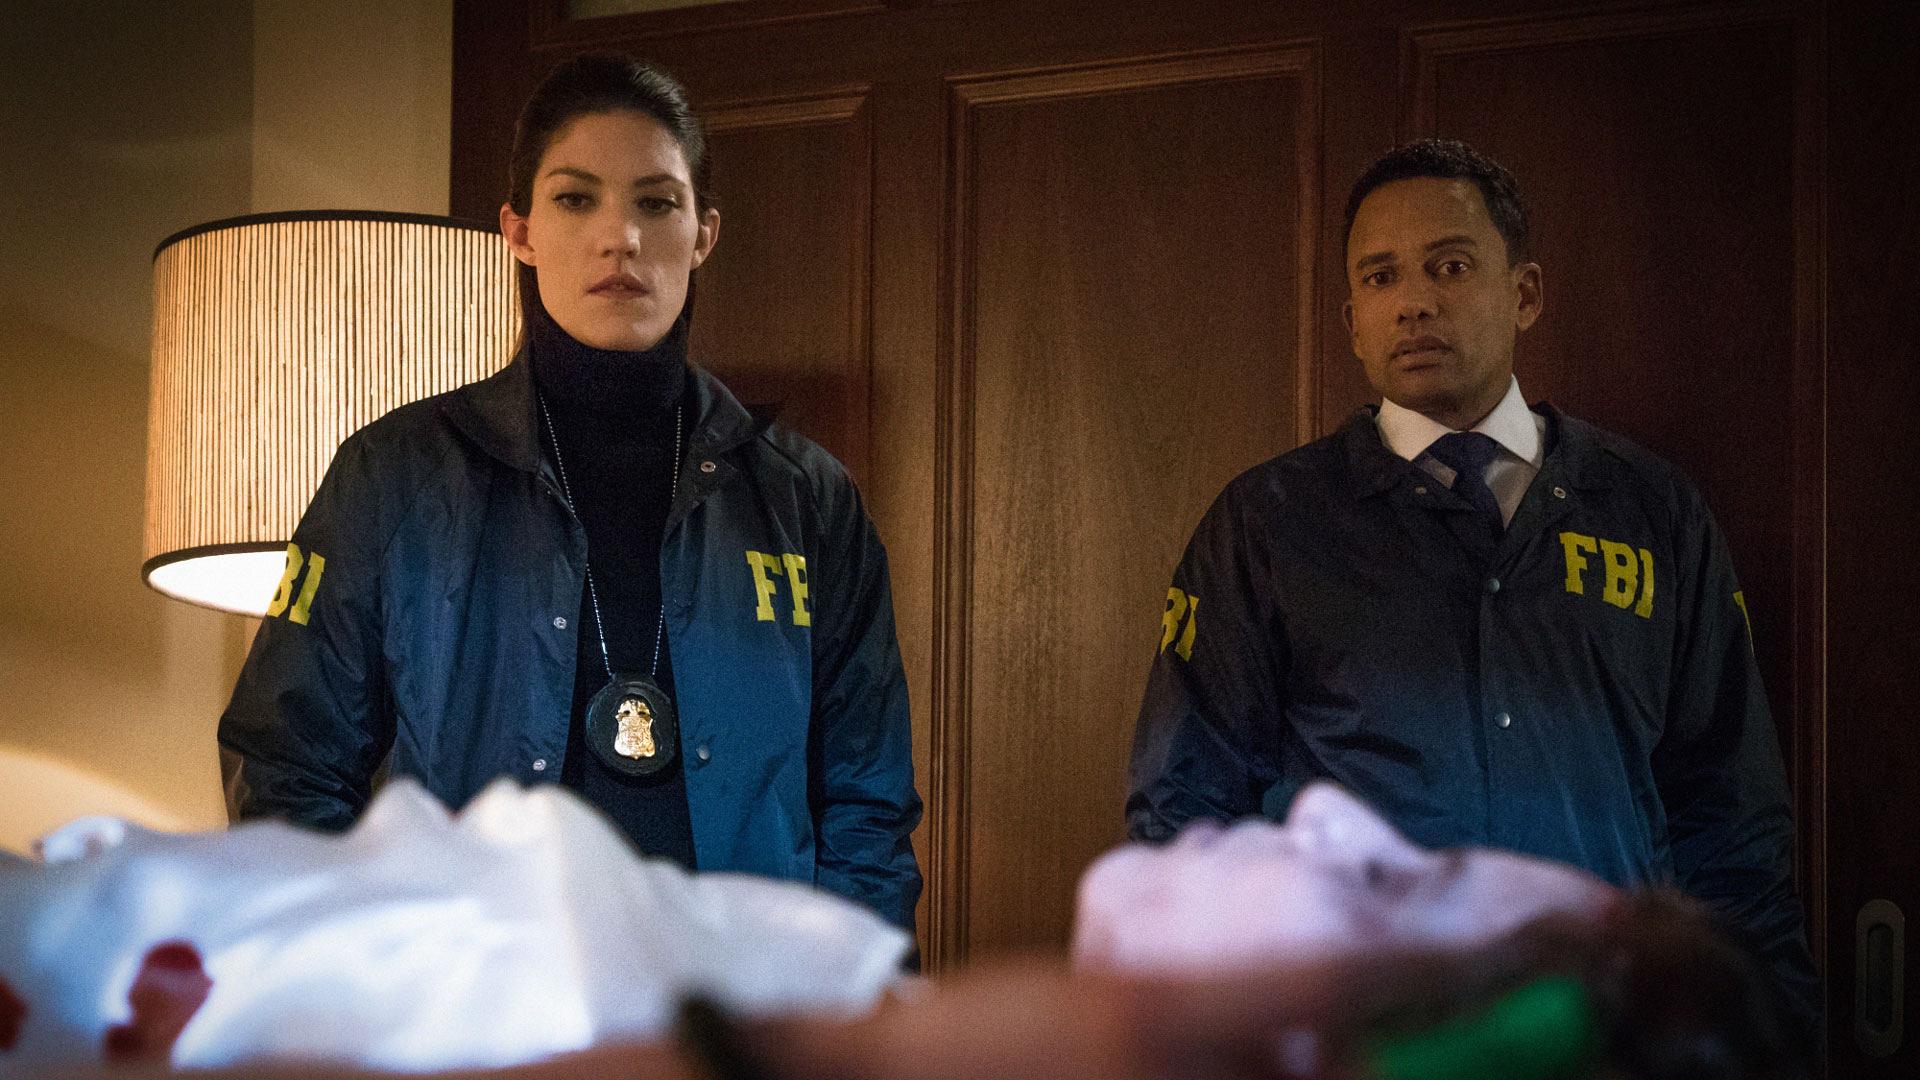 Jennifer Carpenter as Agent Rebecca Harris and Hill Harper as Agent Spellman Boyle